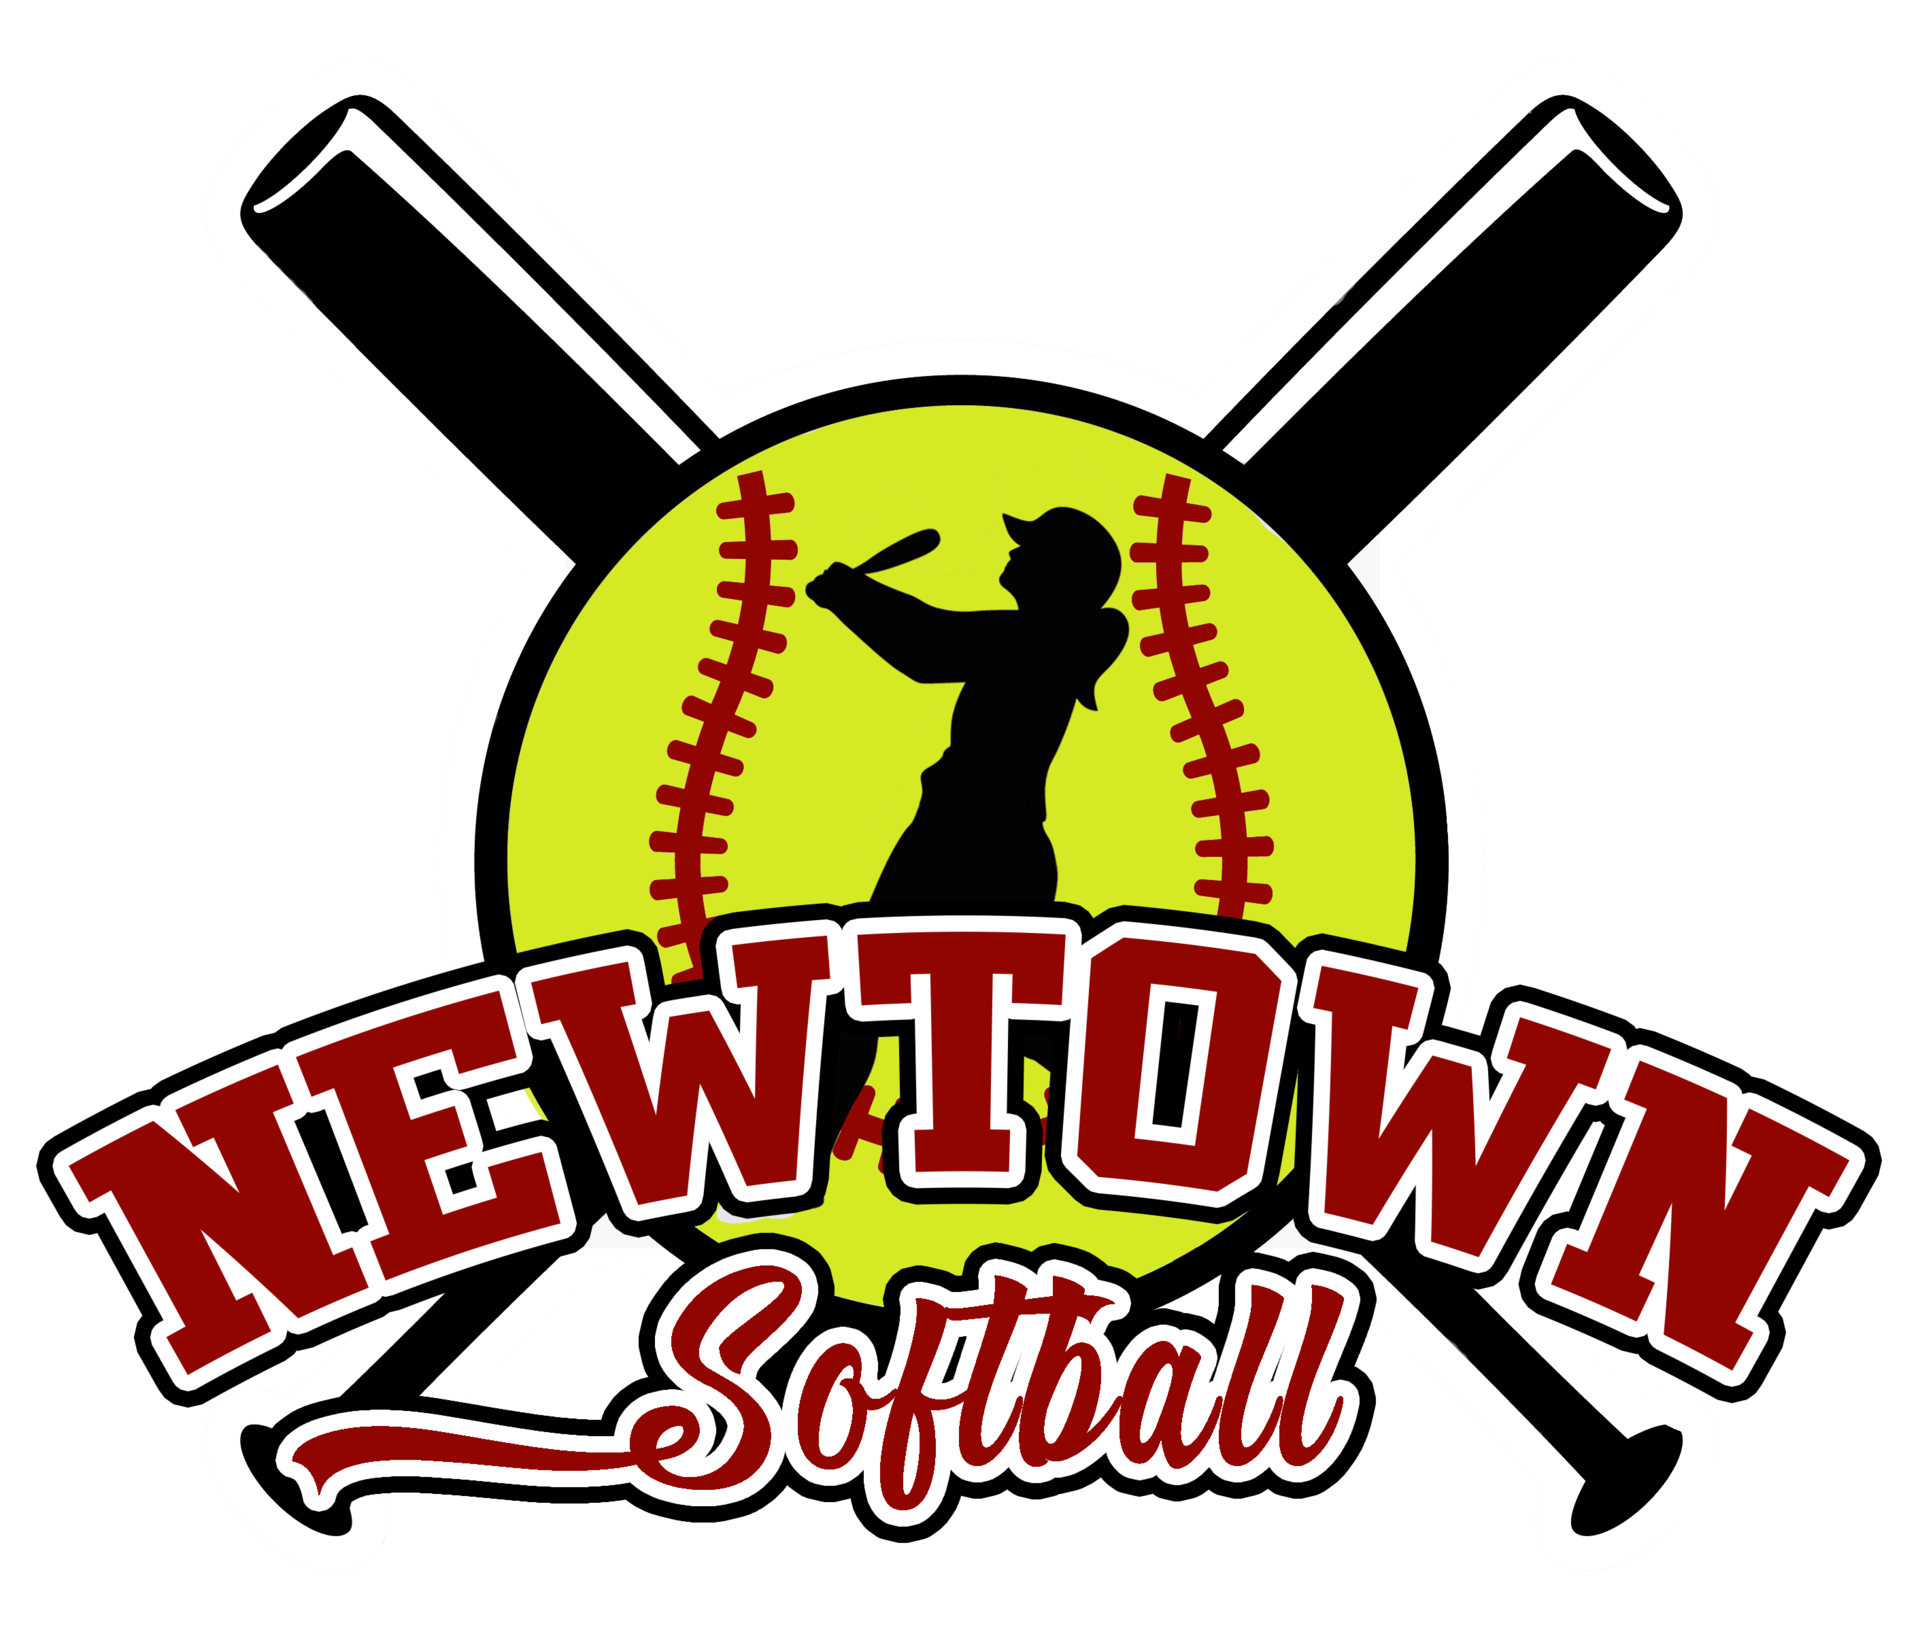 Newtown Softball Logo